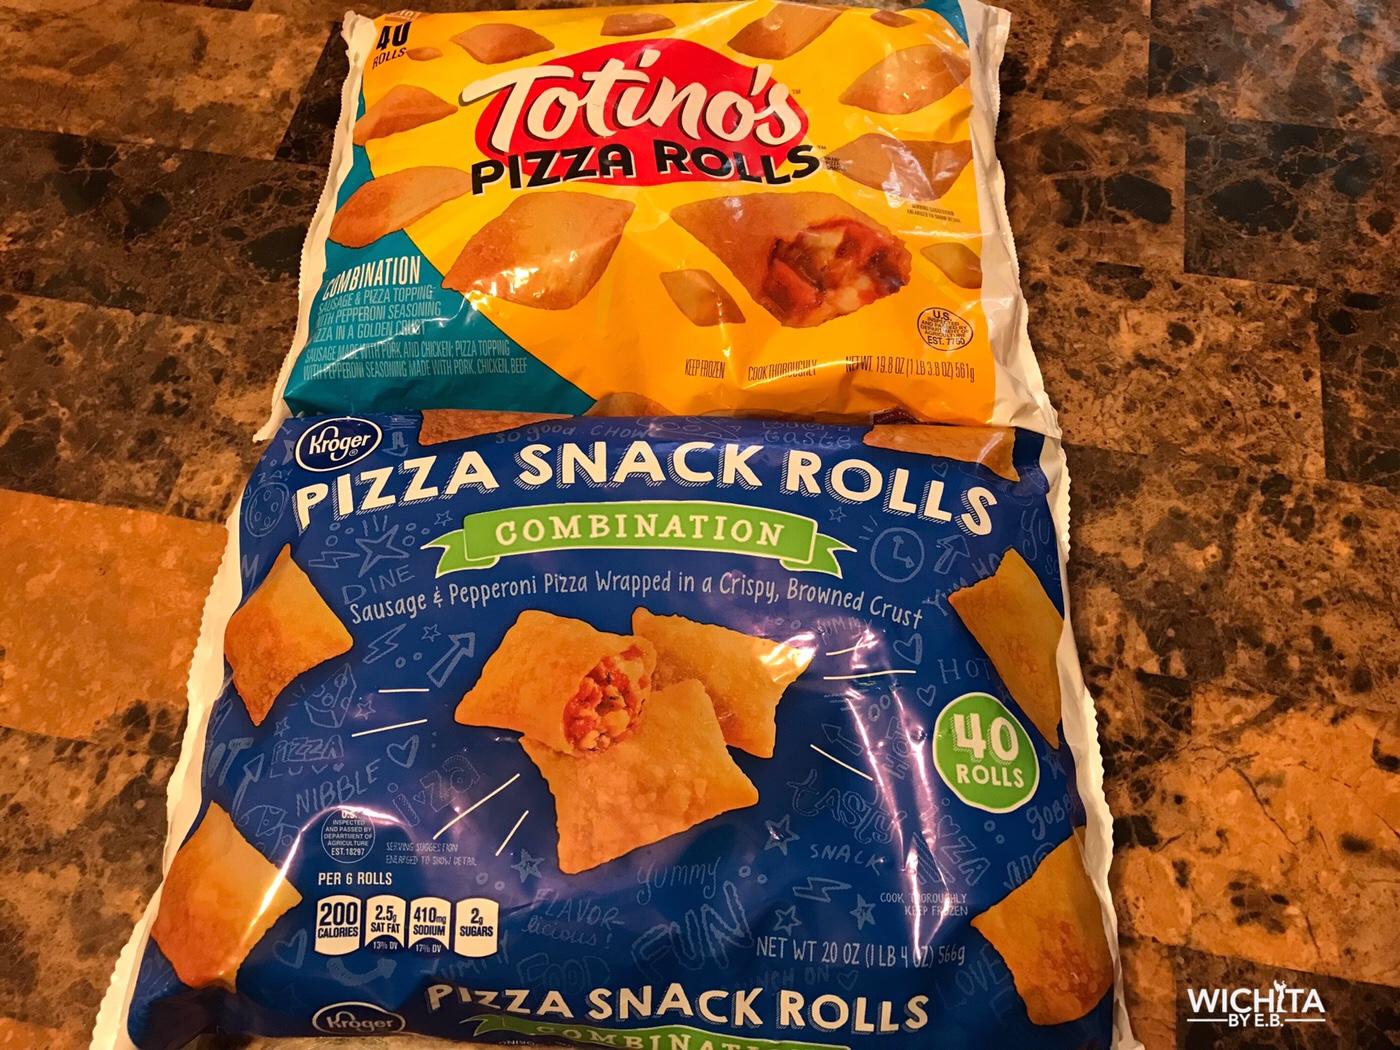 Totinos Pizza Rolls Vs Kroger Pizza Snack Rolls Who Win Wichita By Eb